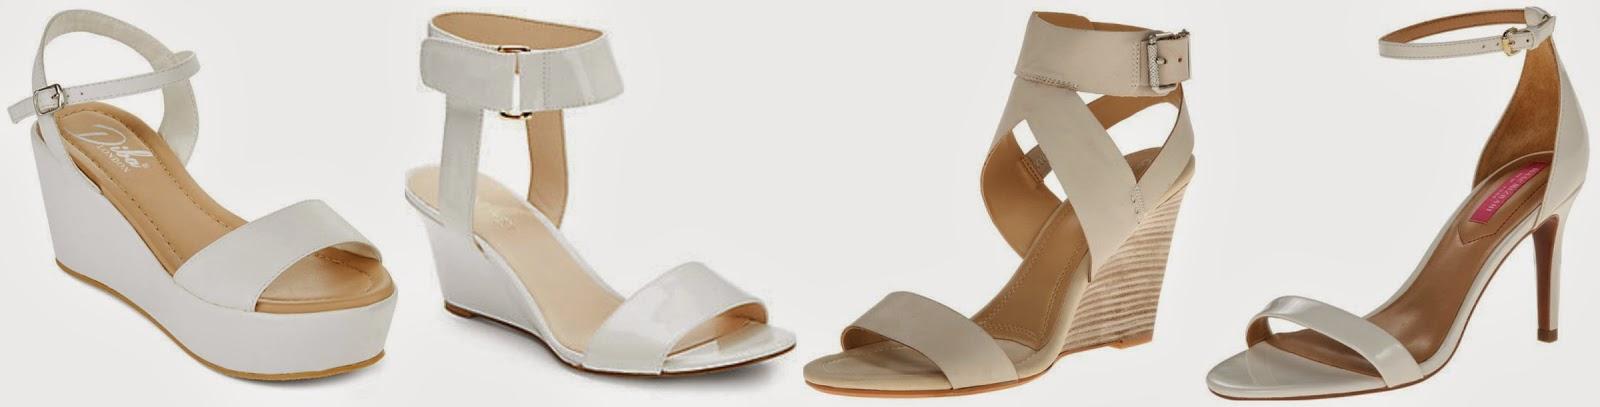 Diba London Wales Quarter Strap Wedge Sandals $34.99 (regular $50.00)  Nine West Riley Ankle Strap Wedge Sandals $39.99 (regular $79.00)  Calvin Klein Maisi Wedge Sandal $58.99 (regular $99.00)  Isaac Mizrahi New York Ispopular Dress Sandal $97.50 (regular $130.00)